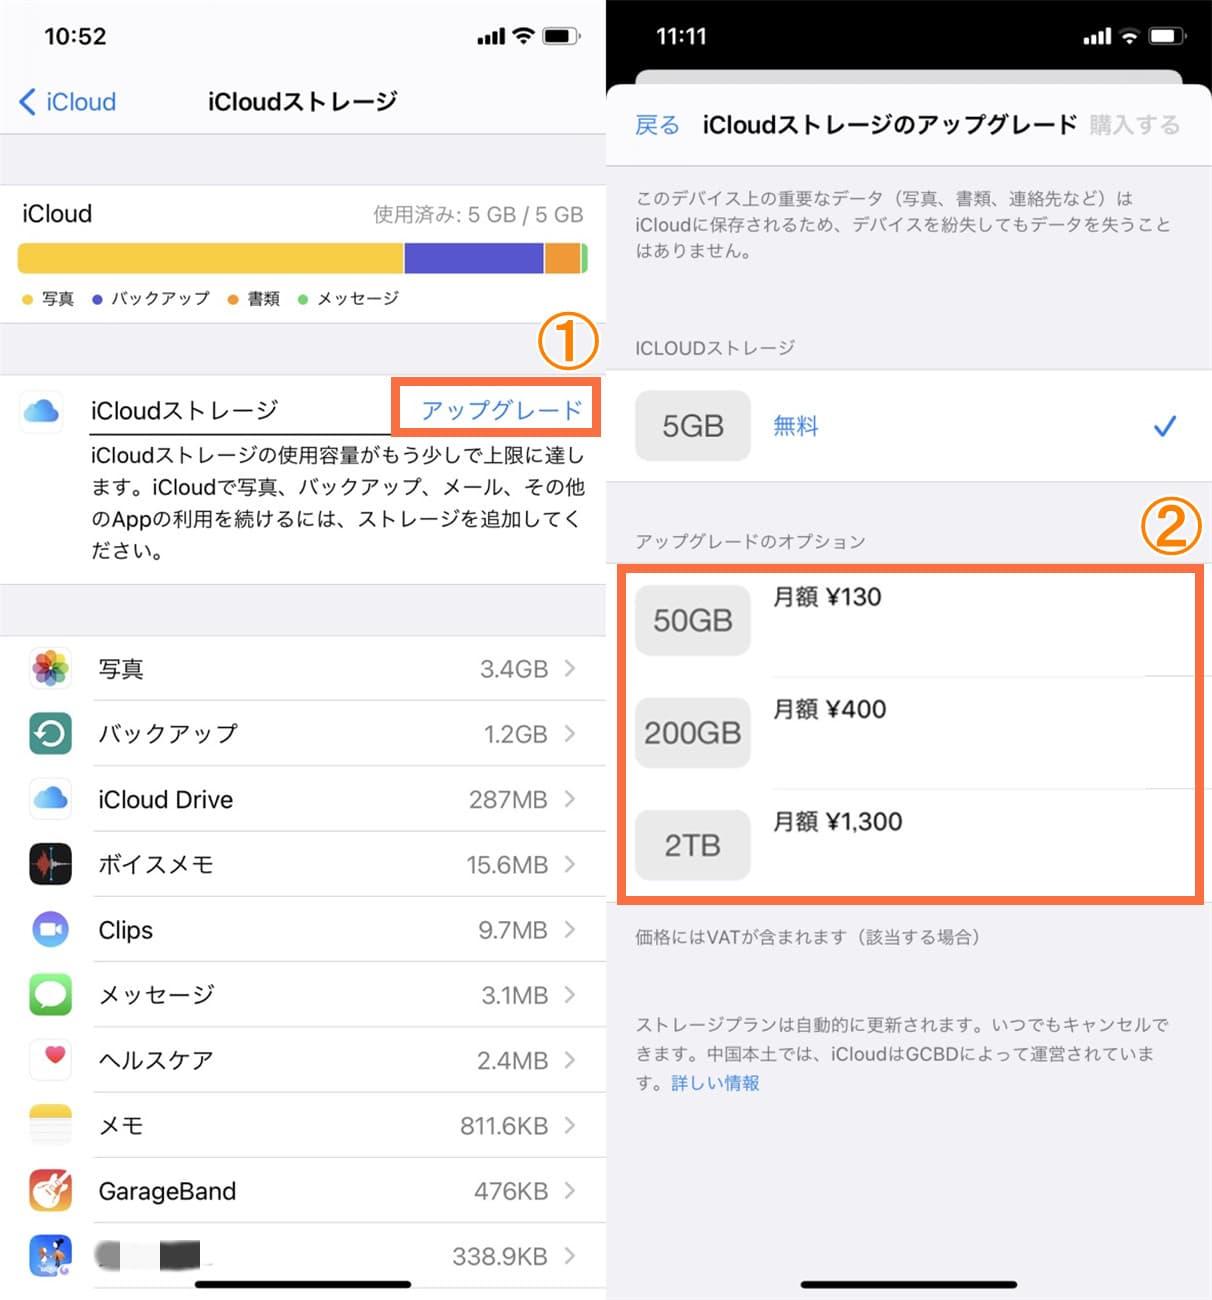 iCloudの有料プランにアップグレード